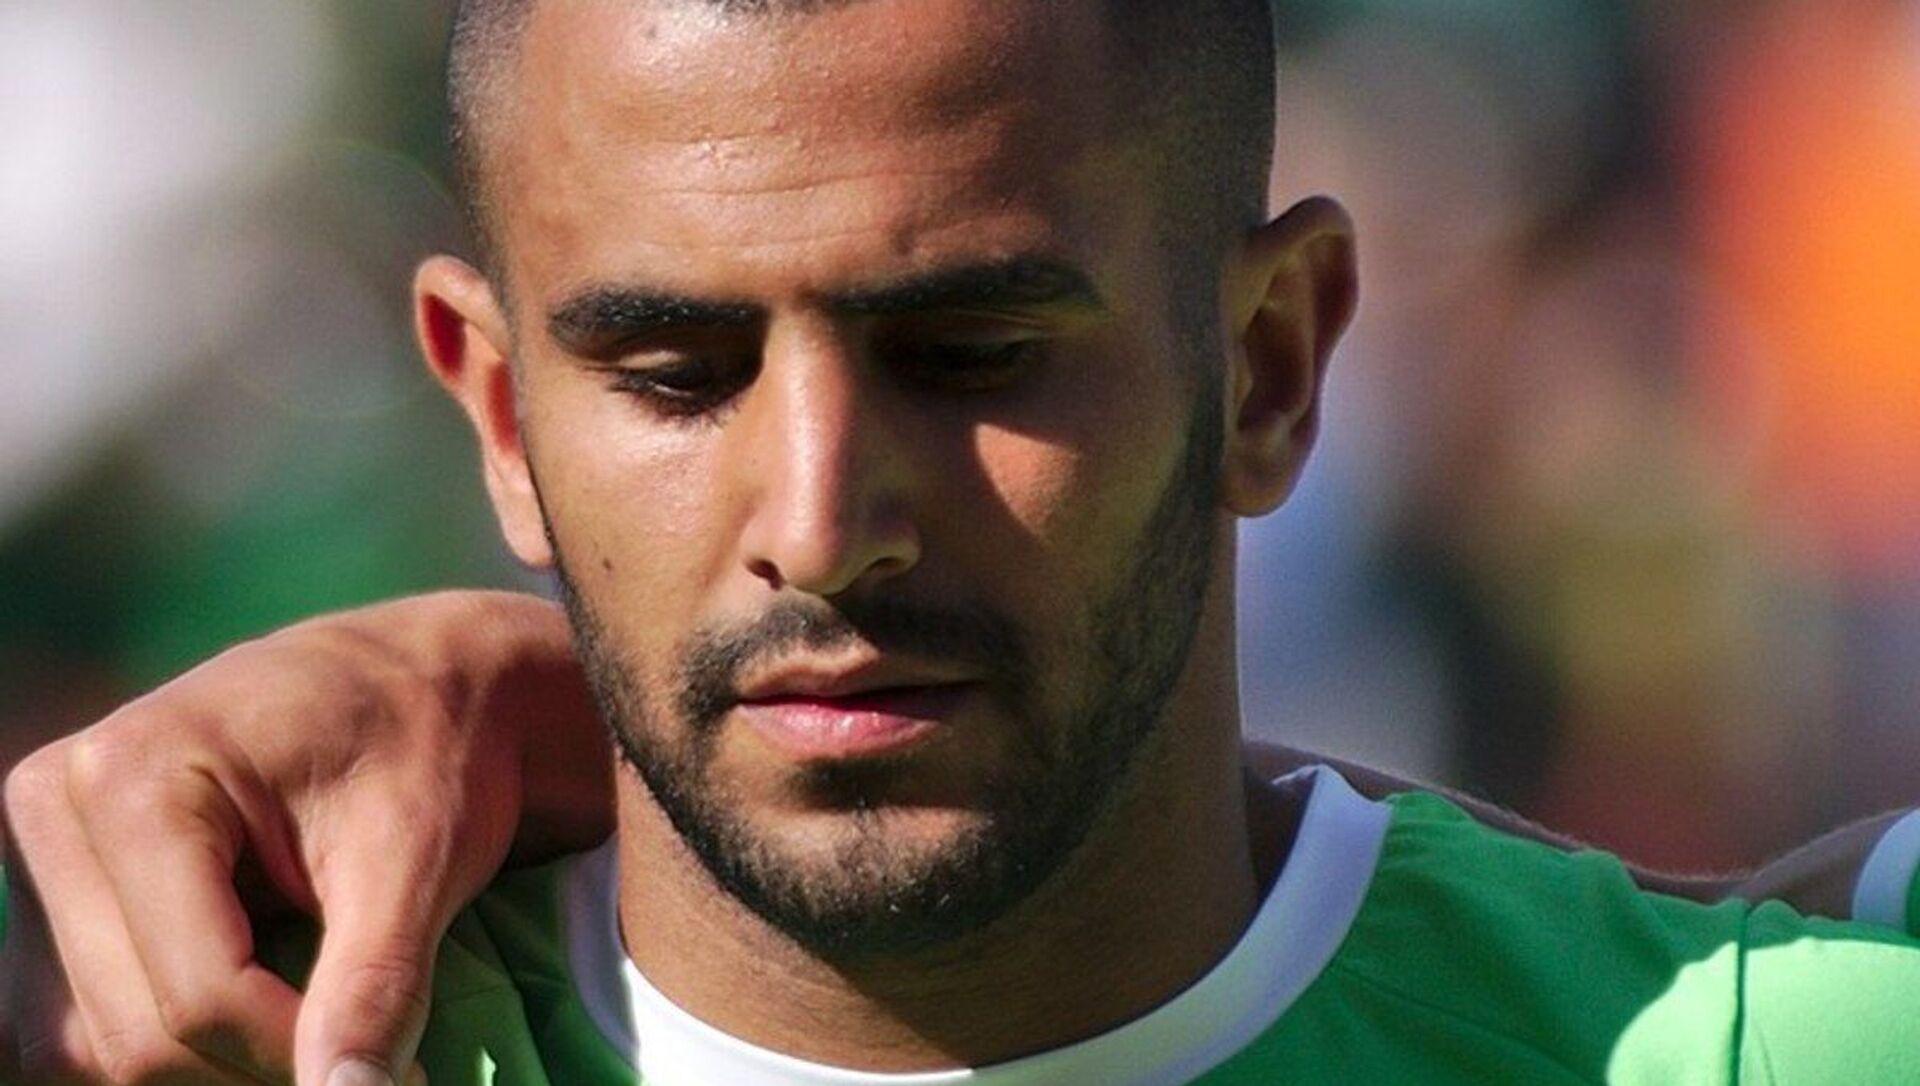 Riyad Mahrez, footballeur international algérien  - Sputnik France, 1920, 22.06.2021